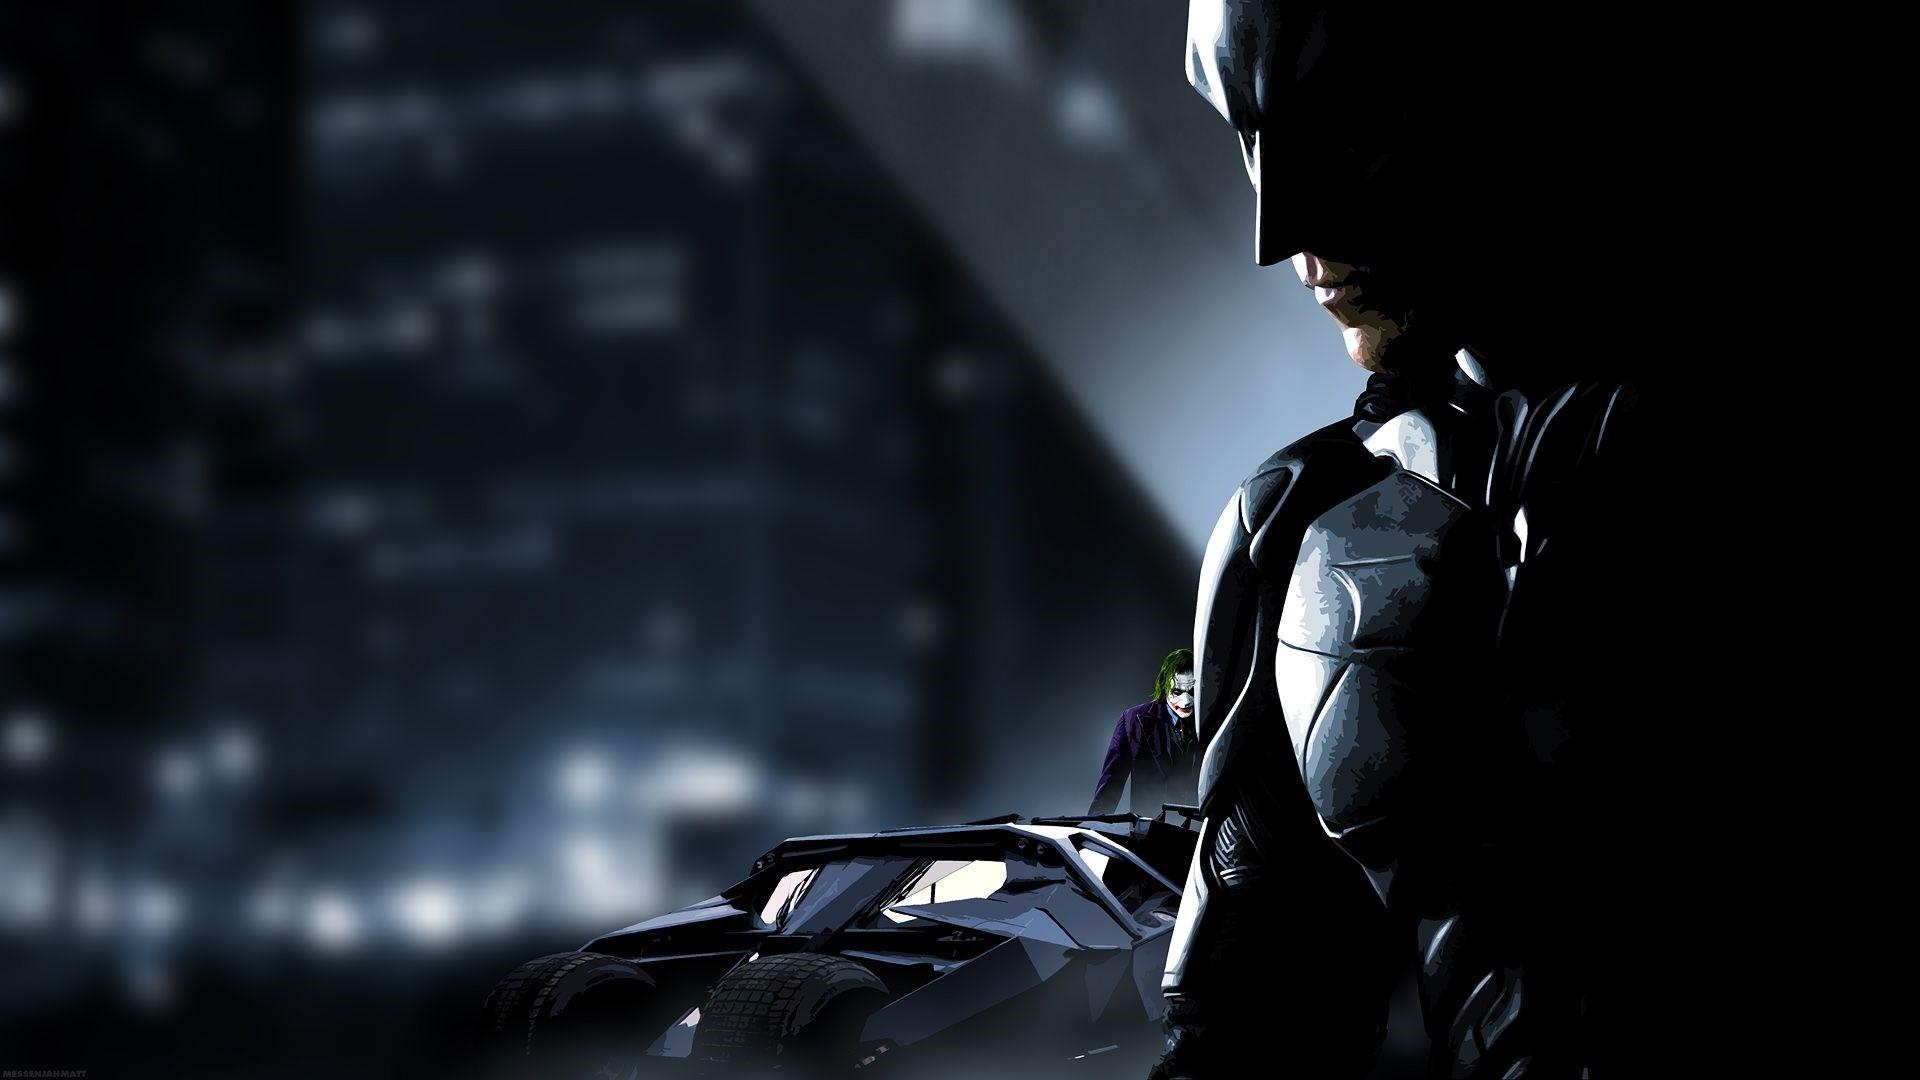 Dark Knight Background Wallpaper HD